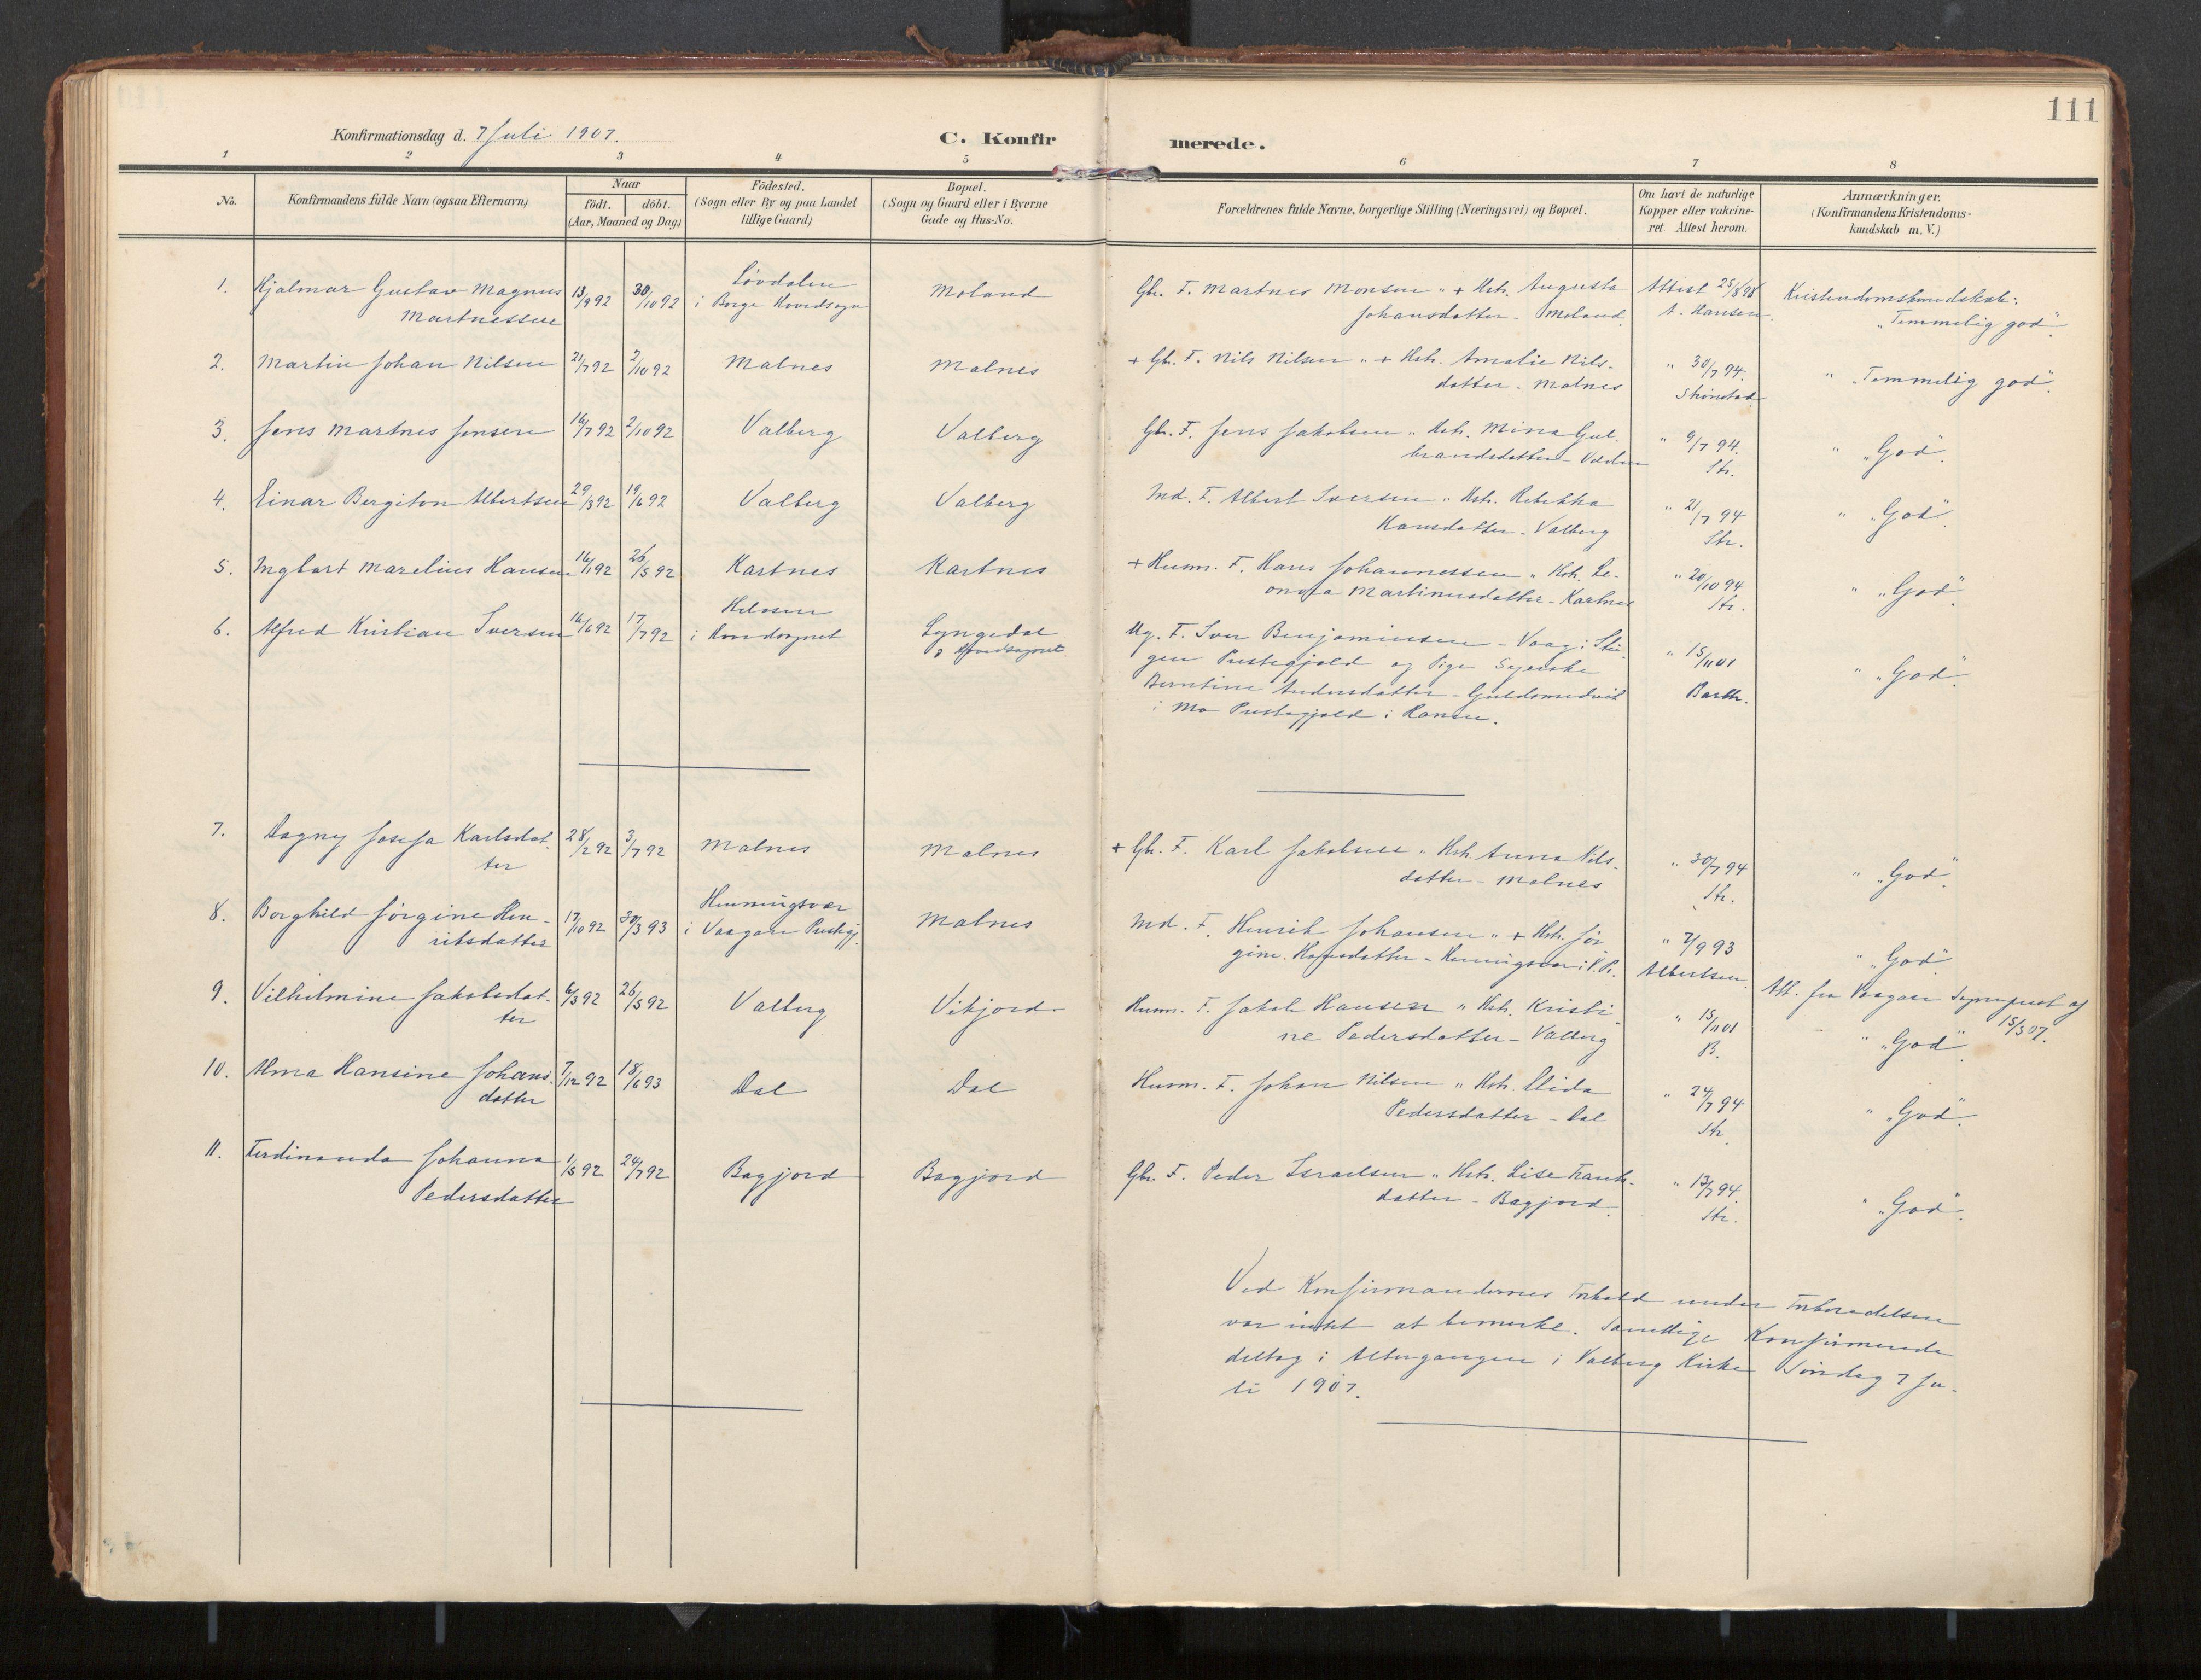 SAT, Ministerialprotokoller, klokkerbøker og fødselsregistre - Nordland, 884/L1194: Ministerialbok nr. 884A02, 1906-1937, s. 111